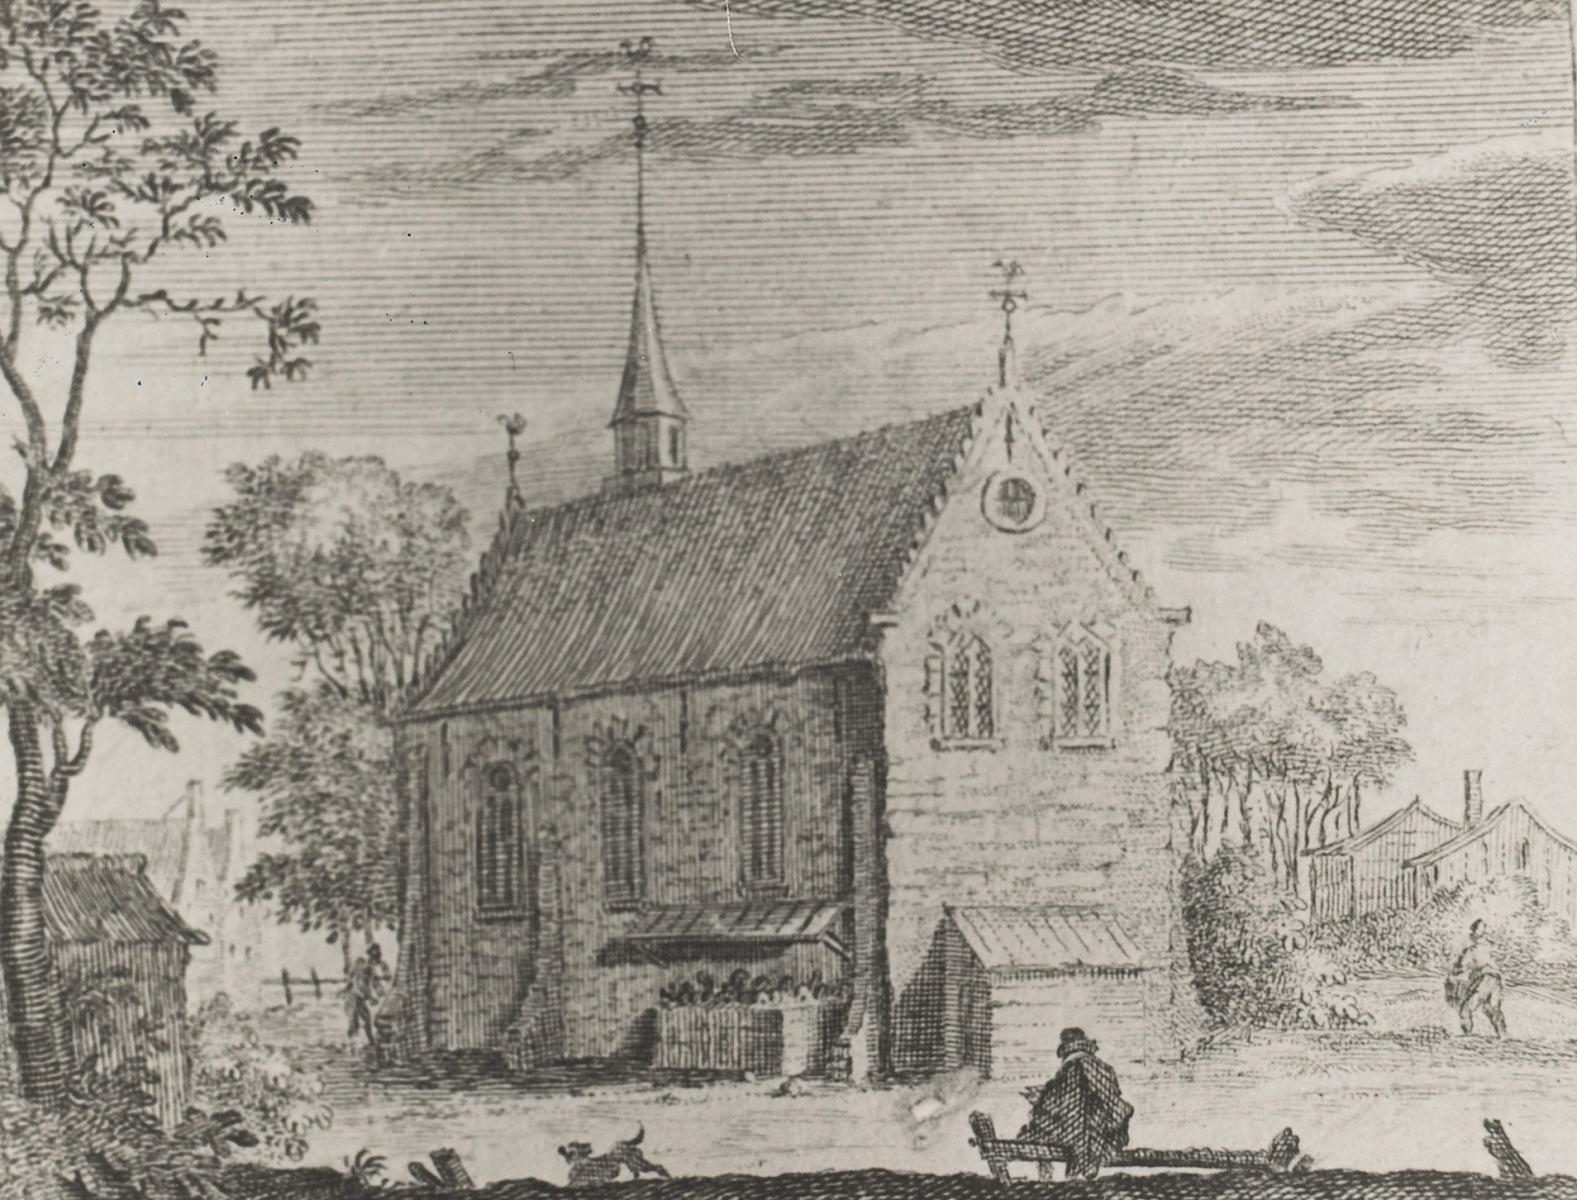 Tekening Nieuwerkerk - Noordhollands Archief